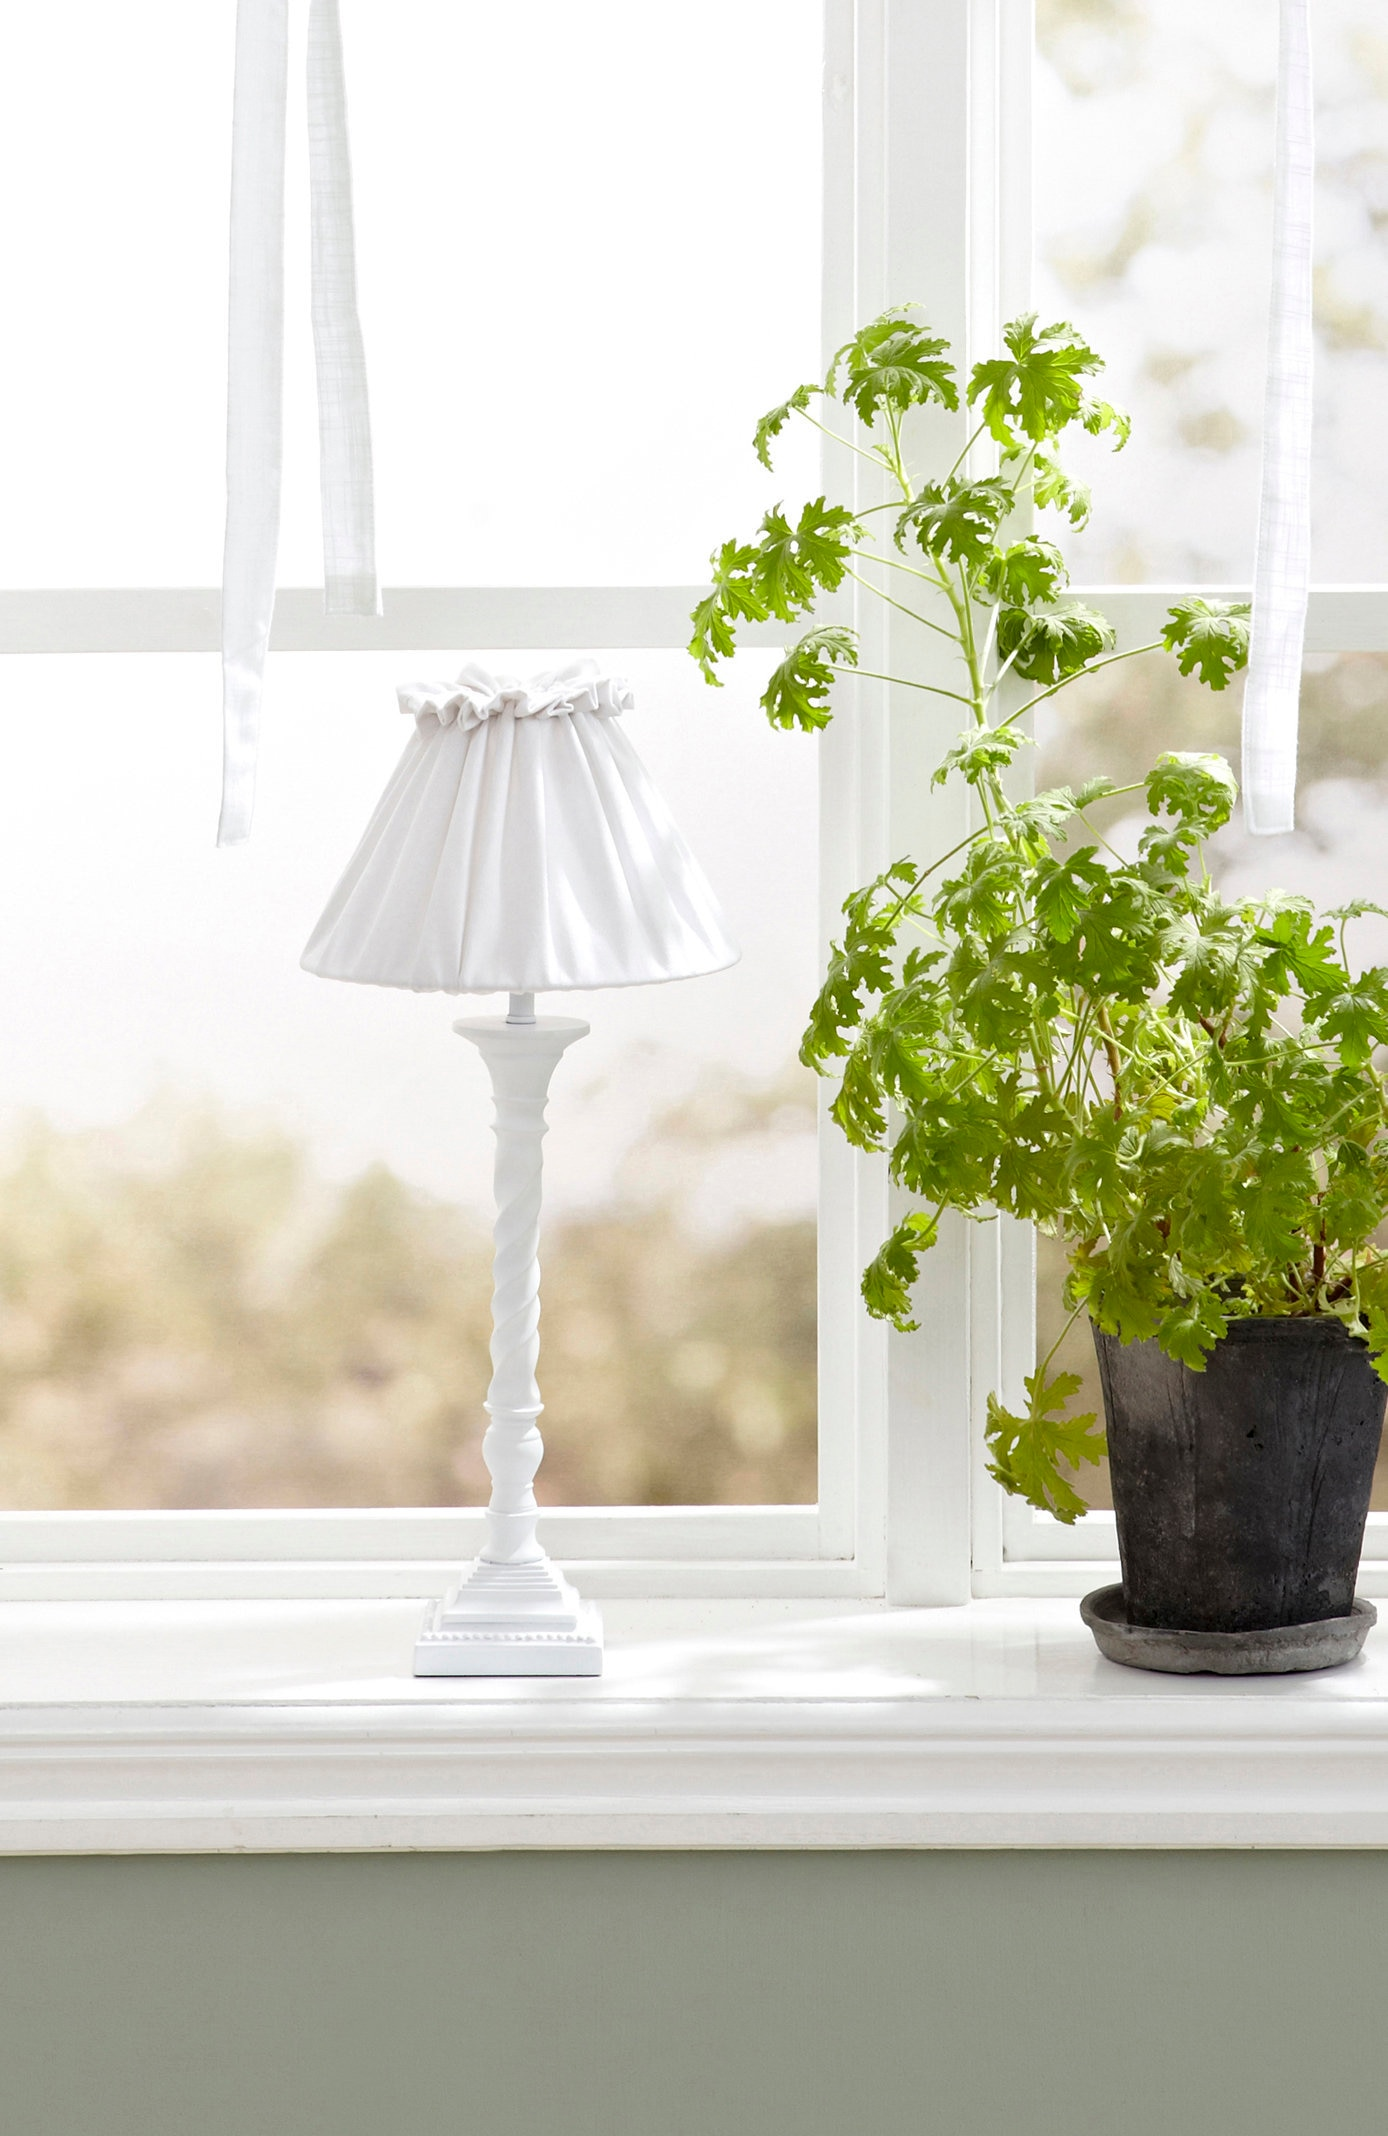 Galda lampa Jane